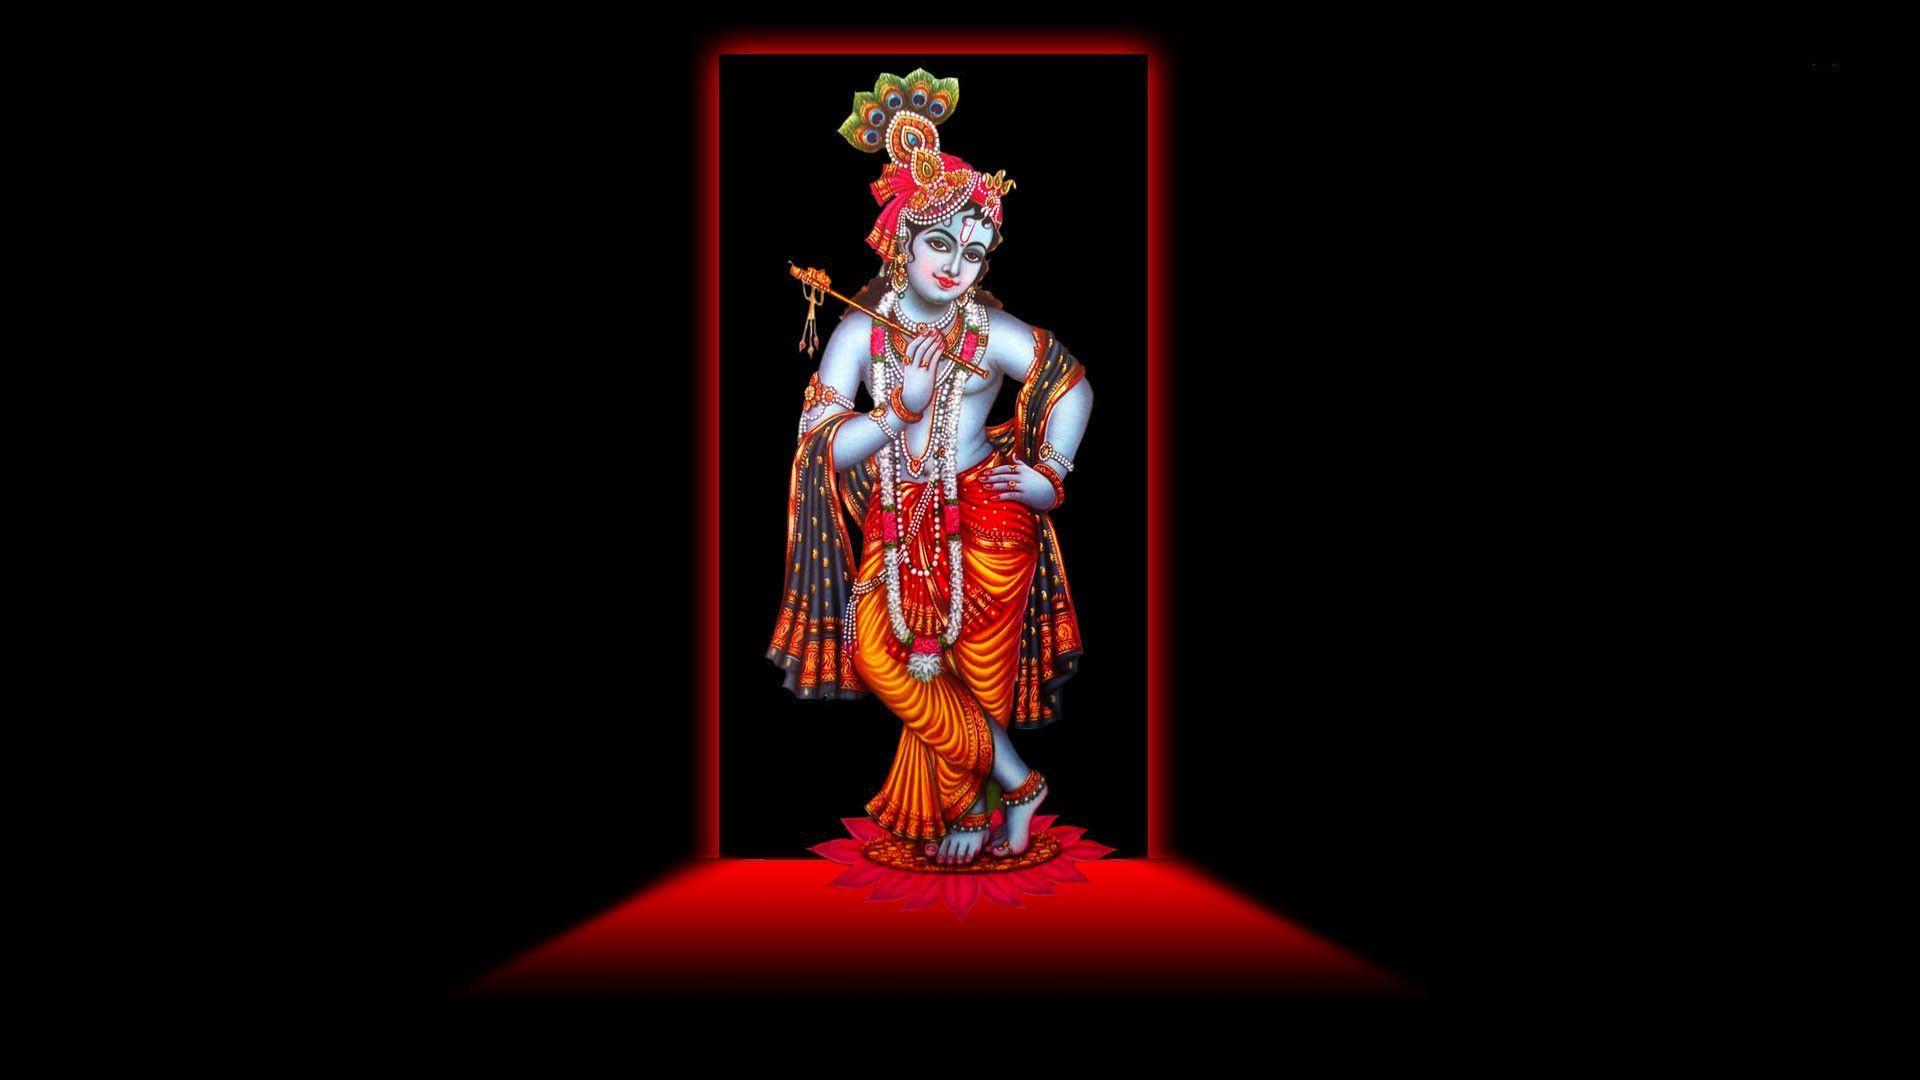 Lord Krishna 4K Wallpapers - Top Free